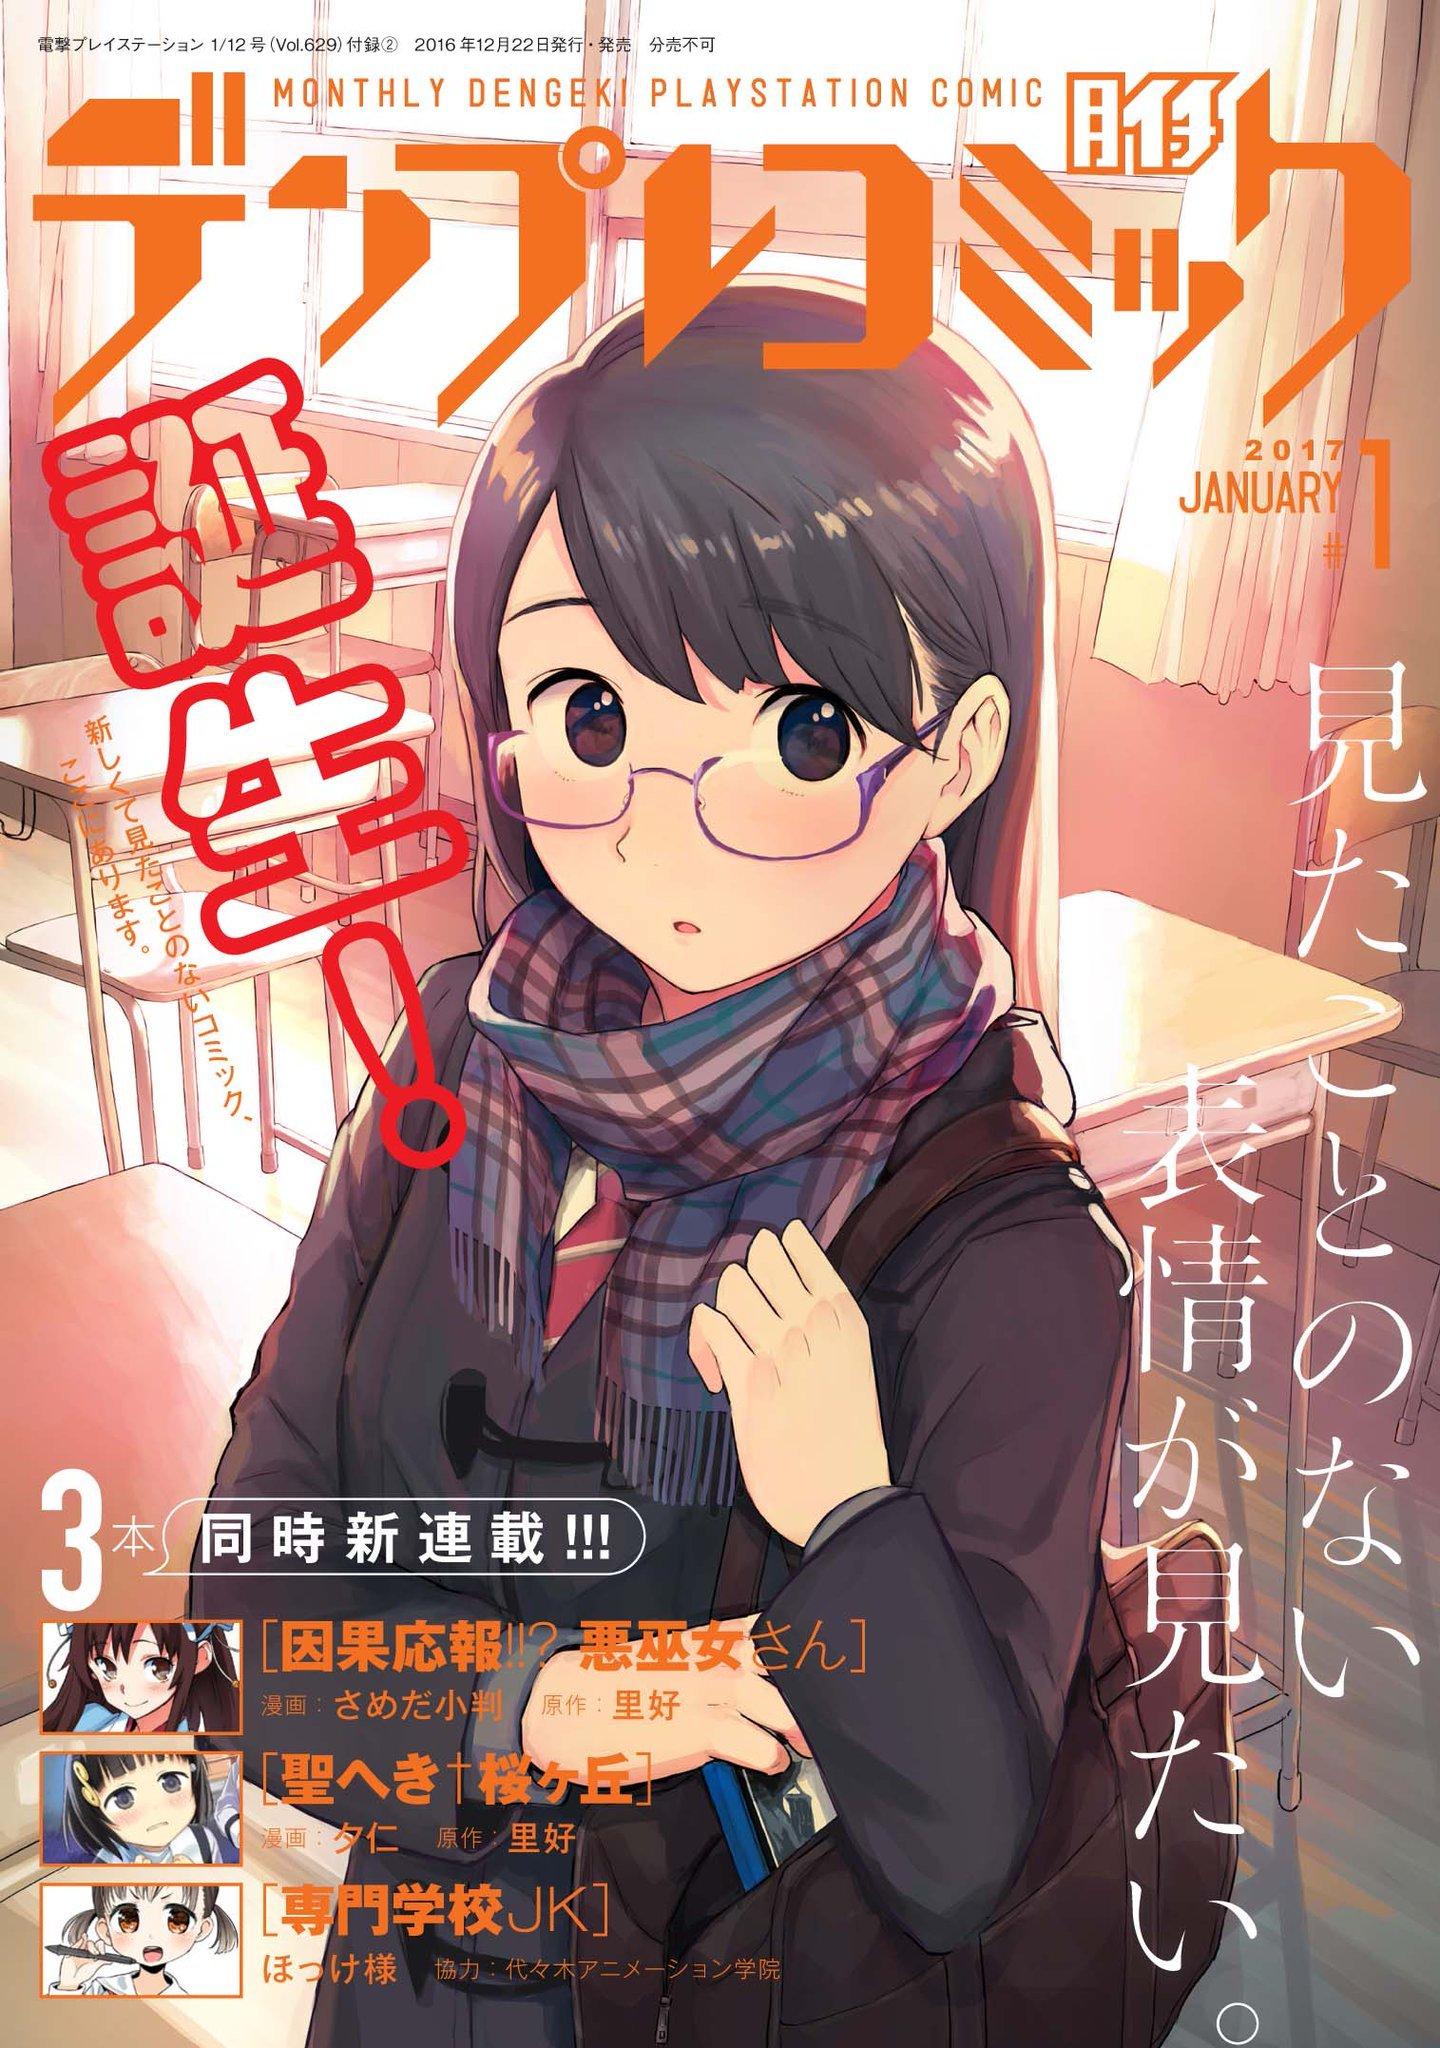 Denplay Comic 001 (Vol.629 supplement) (January 12, 2017)